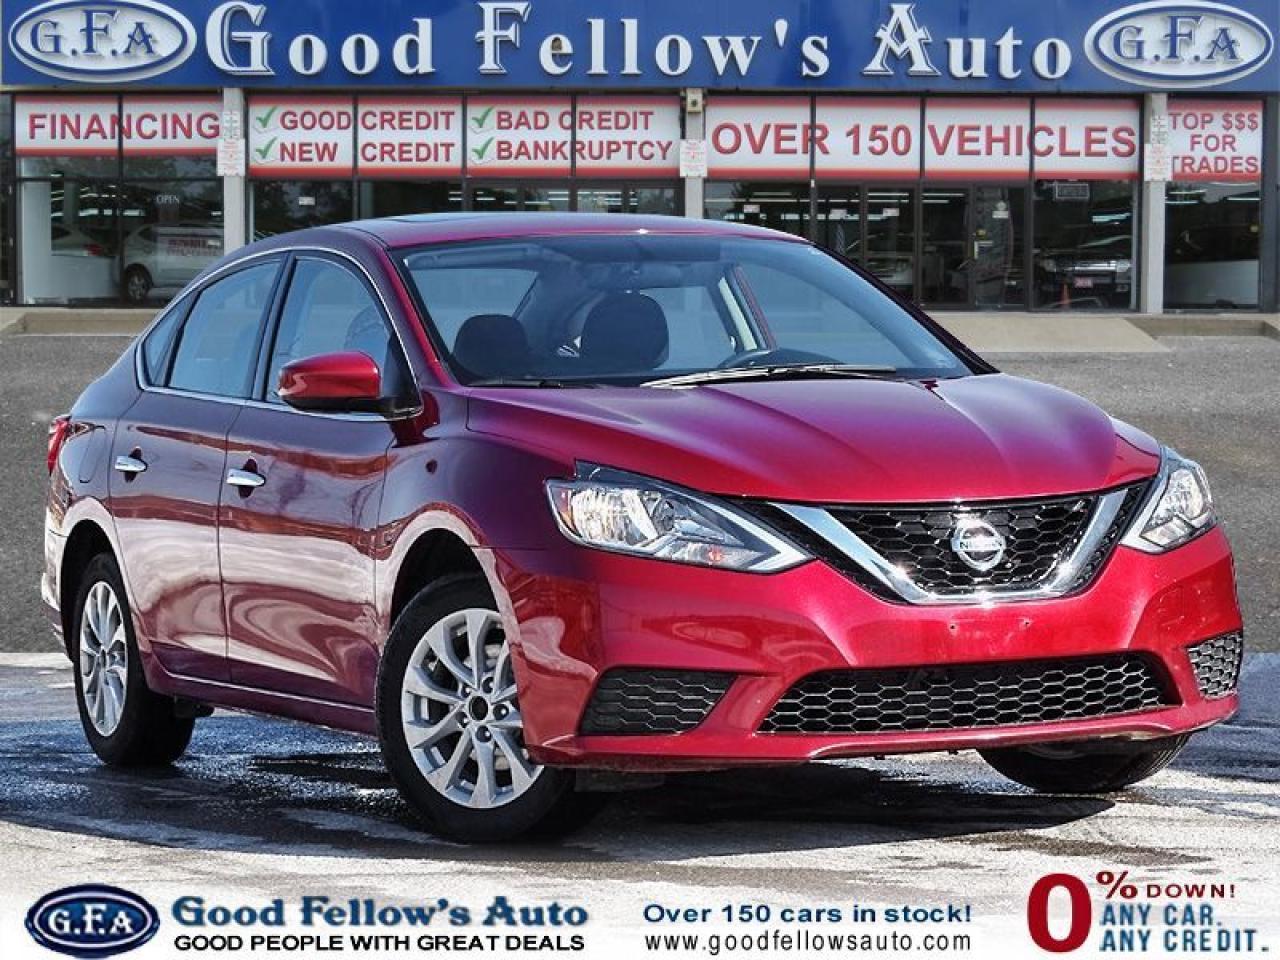 2017 Nissan Sentra SV MODEL, SUNROOF, REARVIEW CAMERA, HEATED SEATS